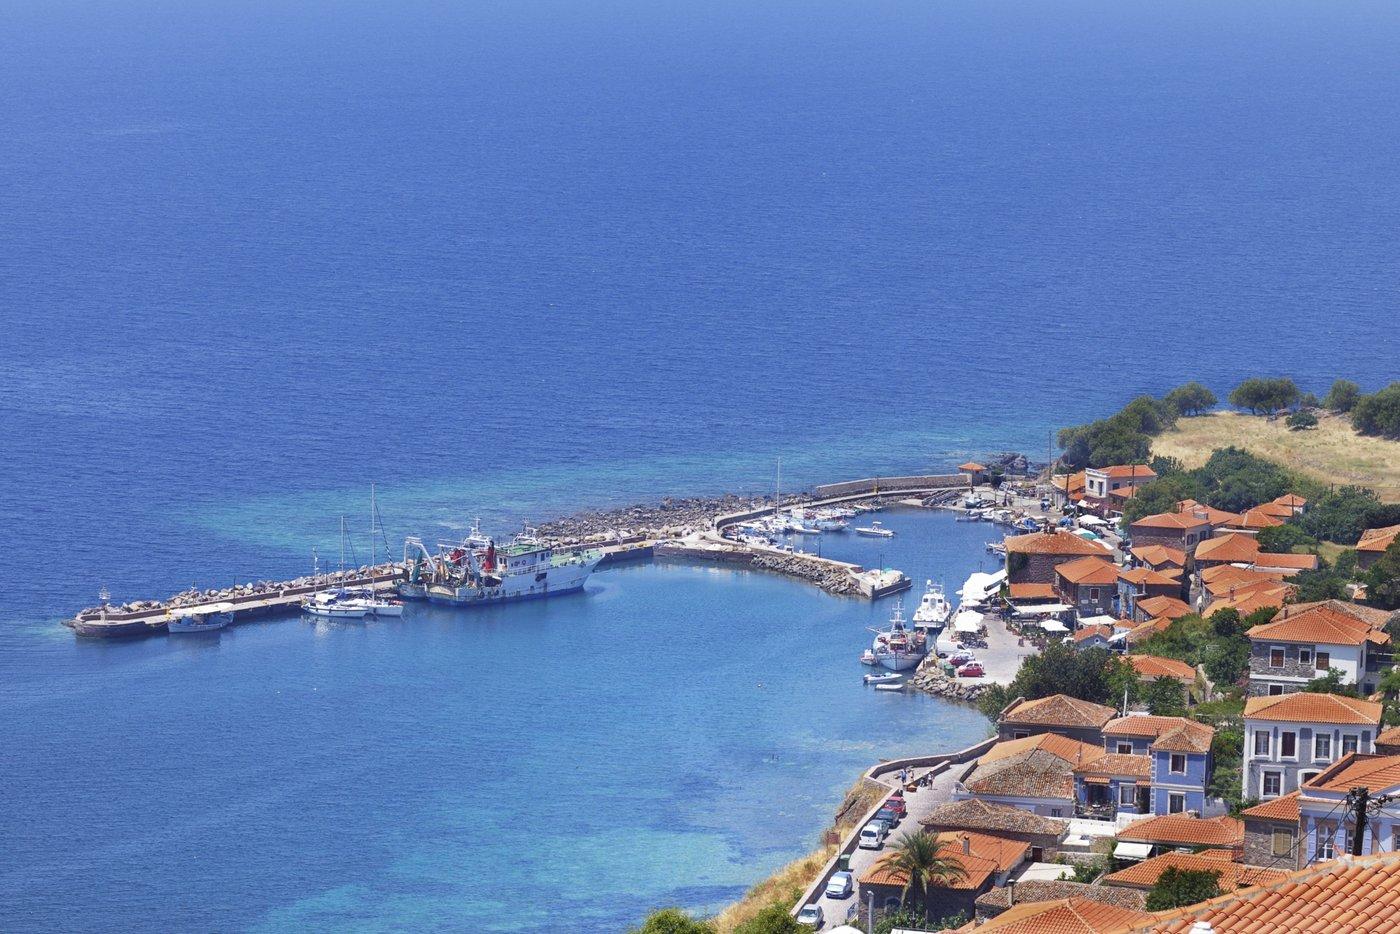 Photo Tour of Aegean Islands 2